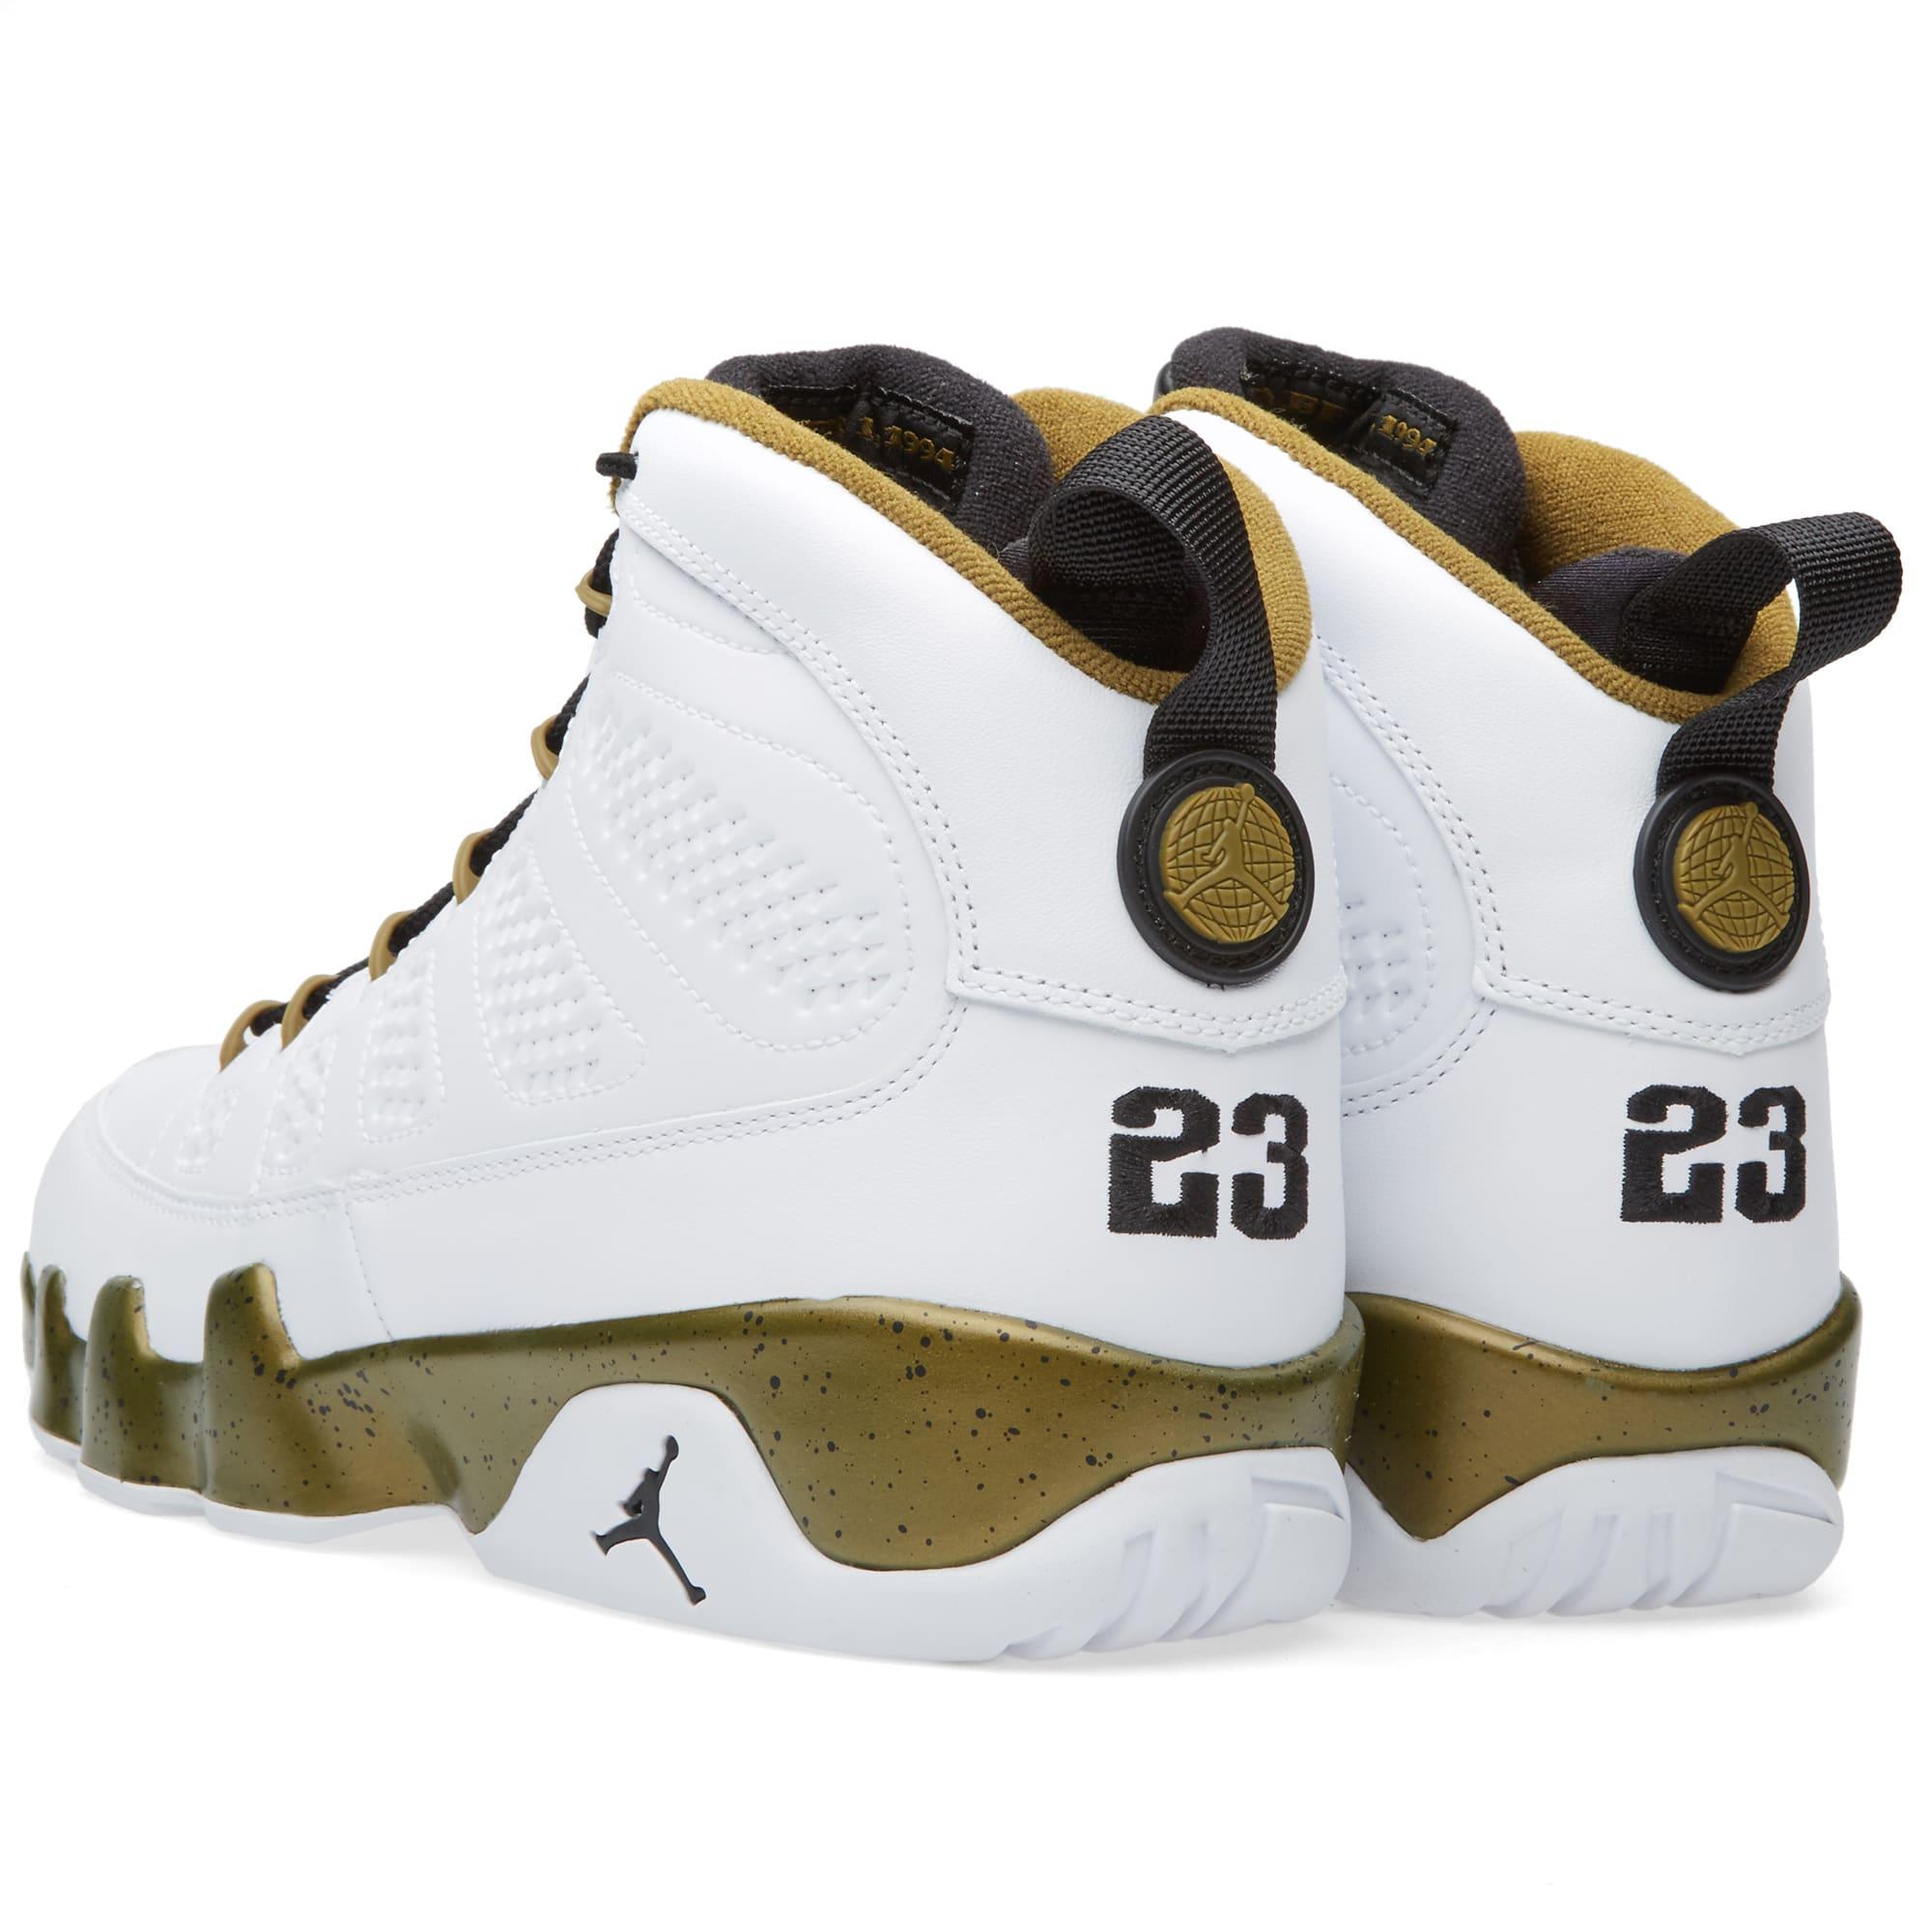 super popular 8e3f6 80c48 Nike Air Jordan 9 Retro  The Spirit  White, Black   Militia Green   END.